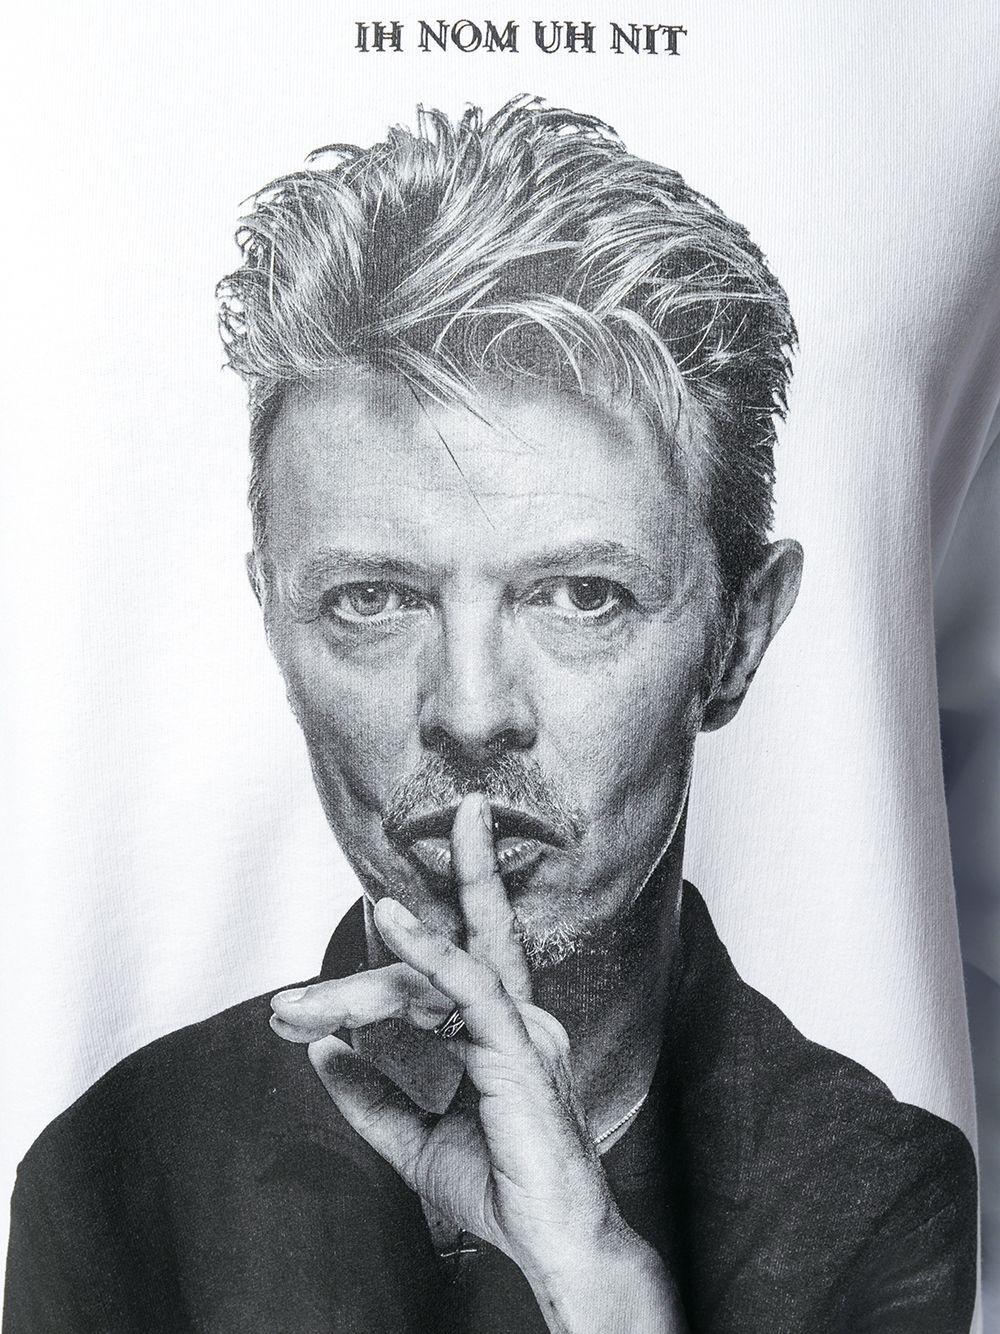 Ih Nom Uh Nit | Ih Nom Uh Nit толстовка с капюшоном и принтом 'Bowie Silence' | Clouty